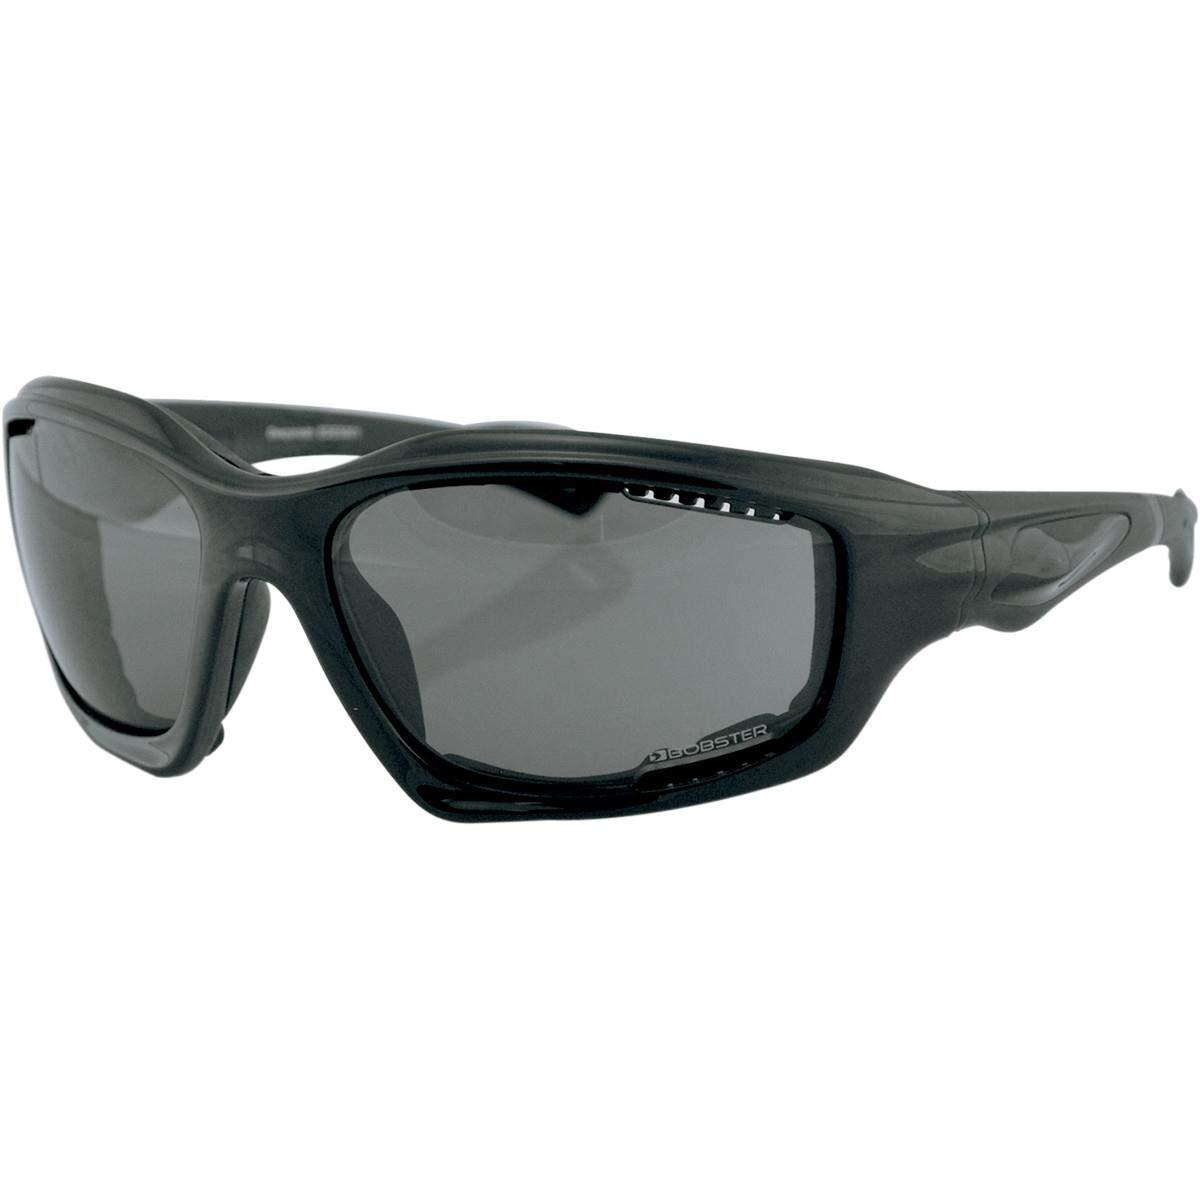 Bobster Eyewear Desperado Sunglasses Black//Smoke Lens EDES001